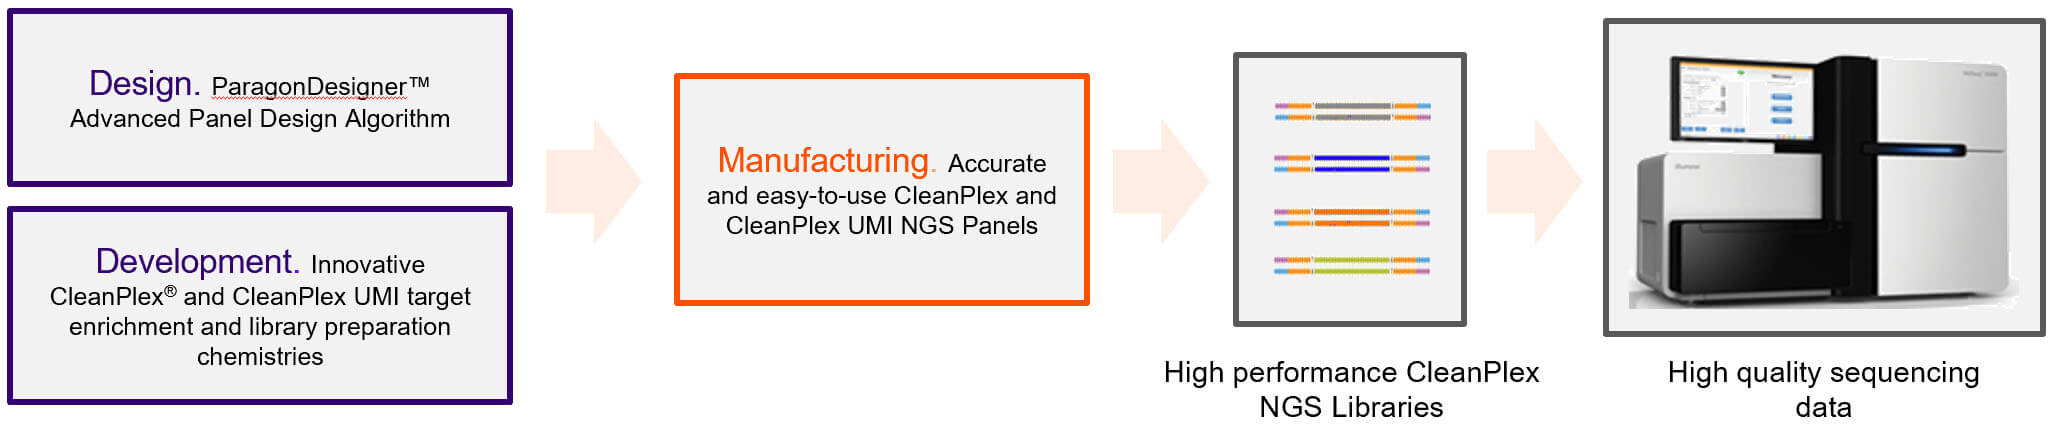 CleanPlex OEM solutions